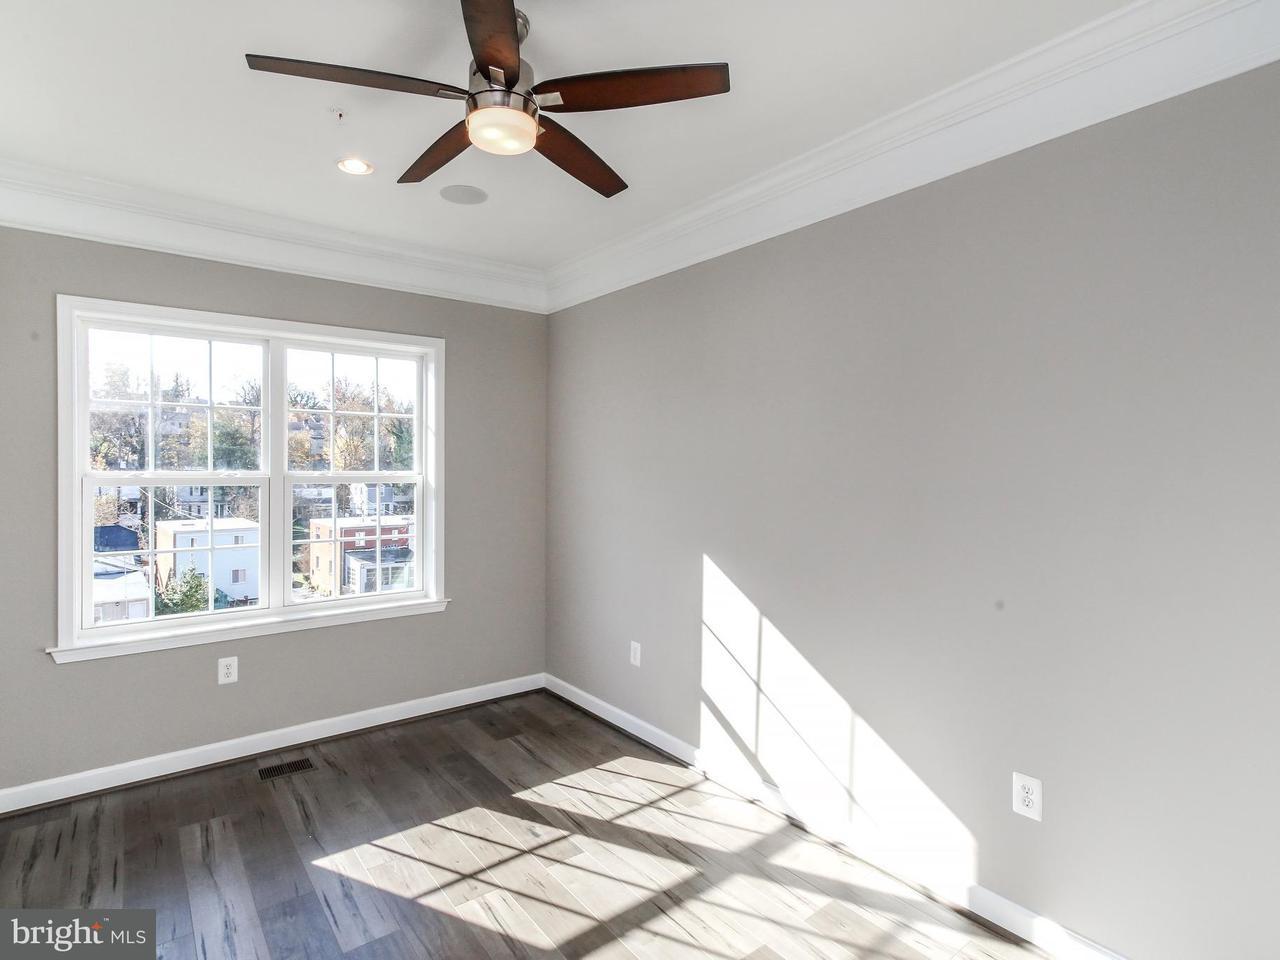 Additional photo for property listing at 5111 Lee St Ne 5111 Lee St Ne Washington, 哥倫比亞特區 20019 美國